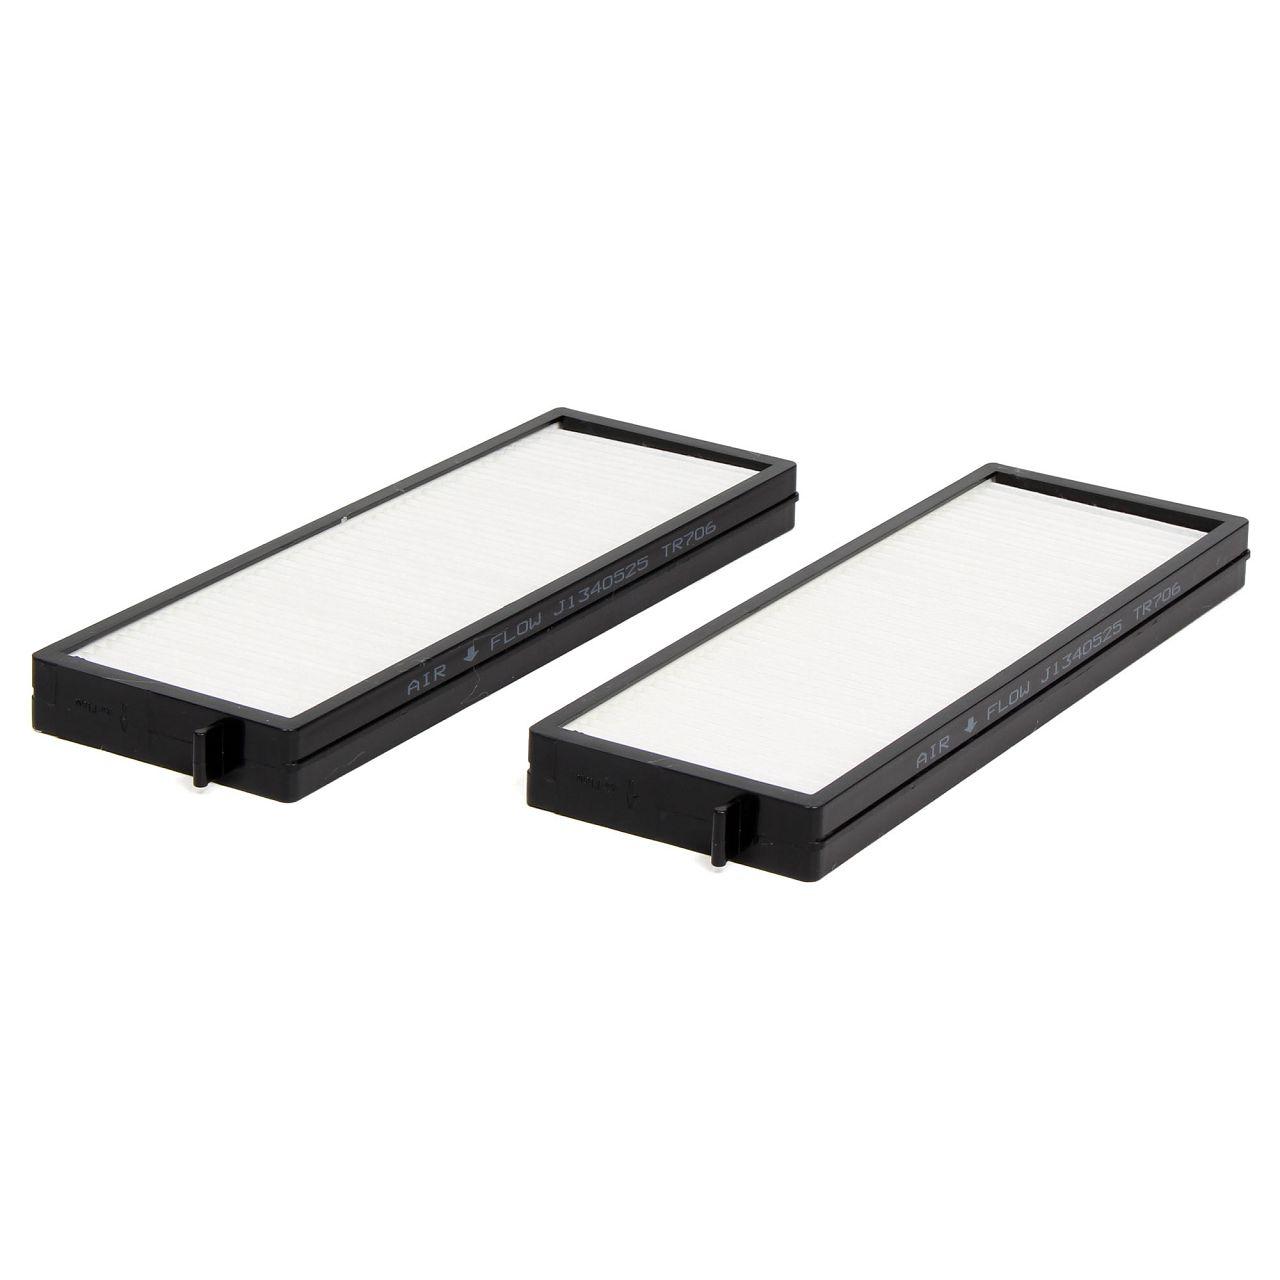 HERTH+BUSS JAKOPARTS Filterpaket Filterset für HYUNDAI i20 (PB PBT) 1.2 86 PS